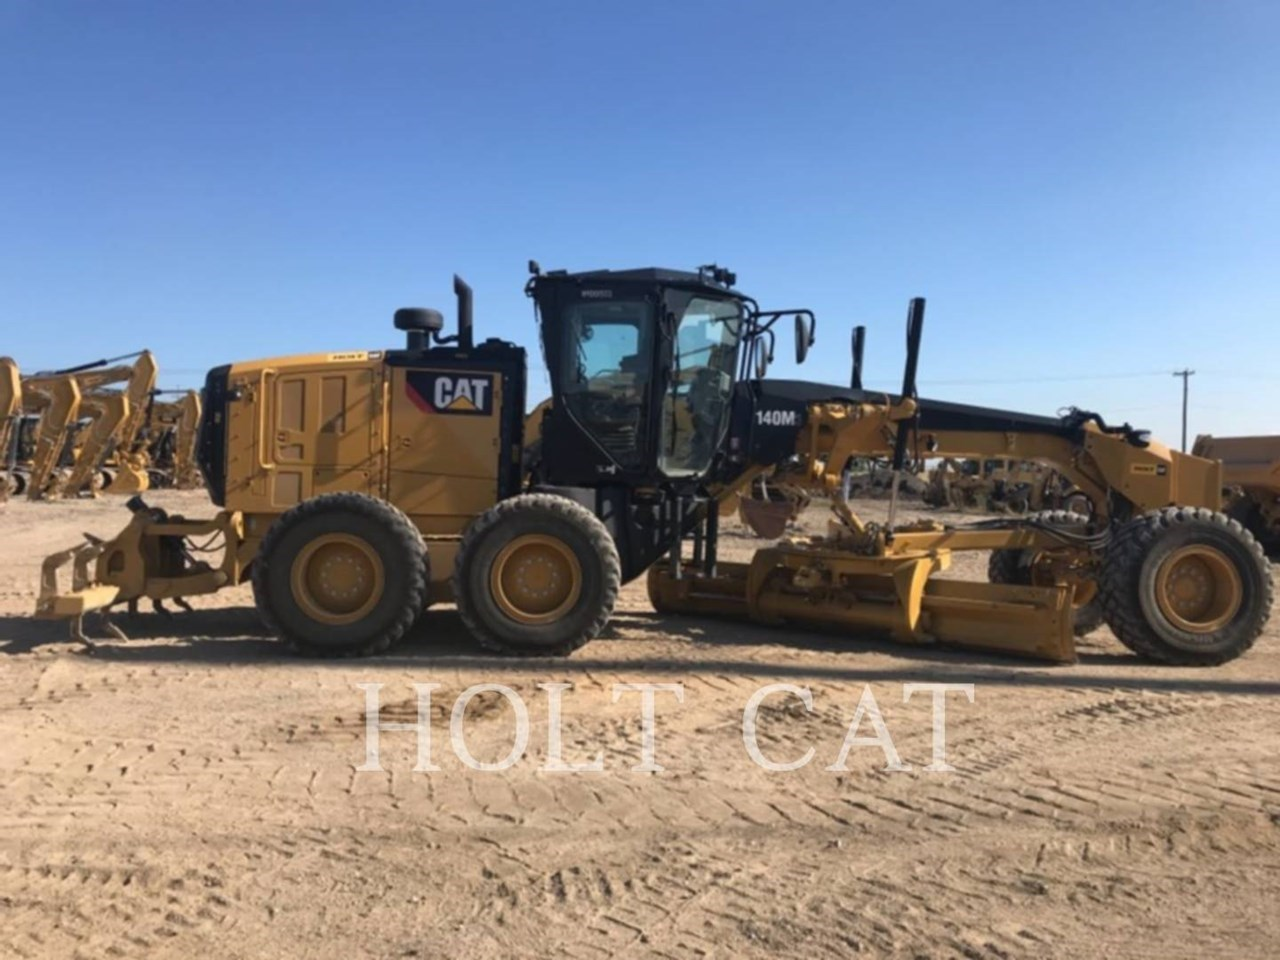 2019 Caterpillar 140M3 Image 3